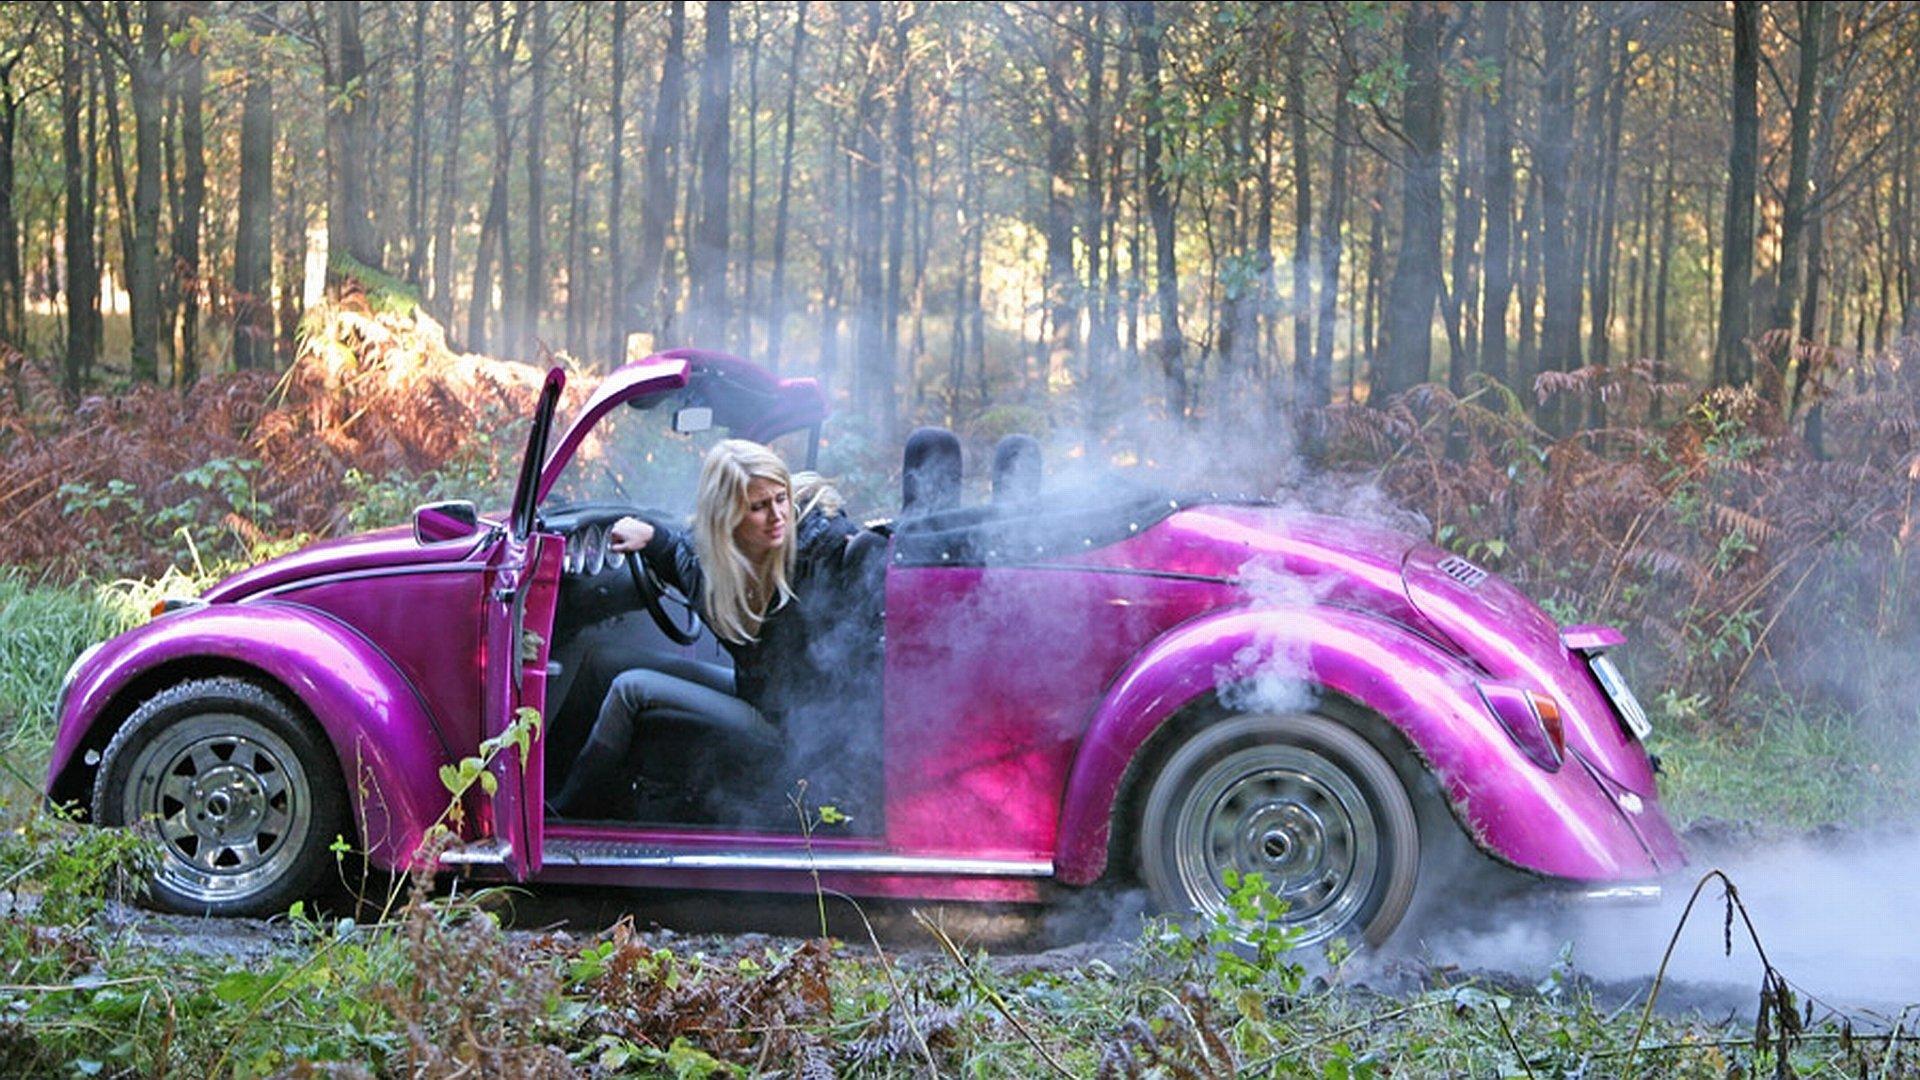 3840x1080 Wallpaper Classic Car Girls Amp Cars Hd Wallpaper Background Image 1920x1080